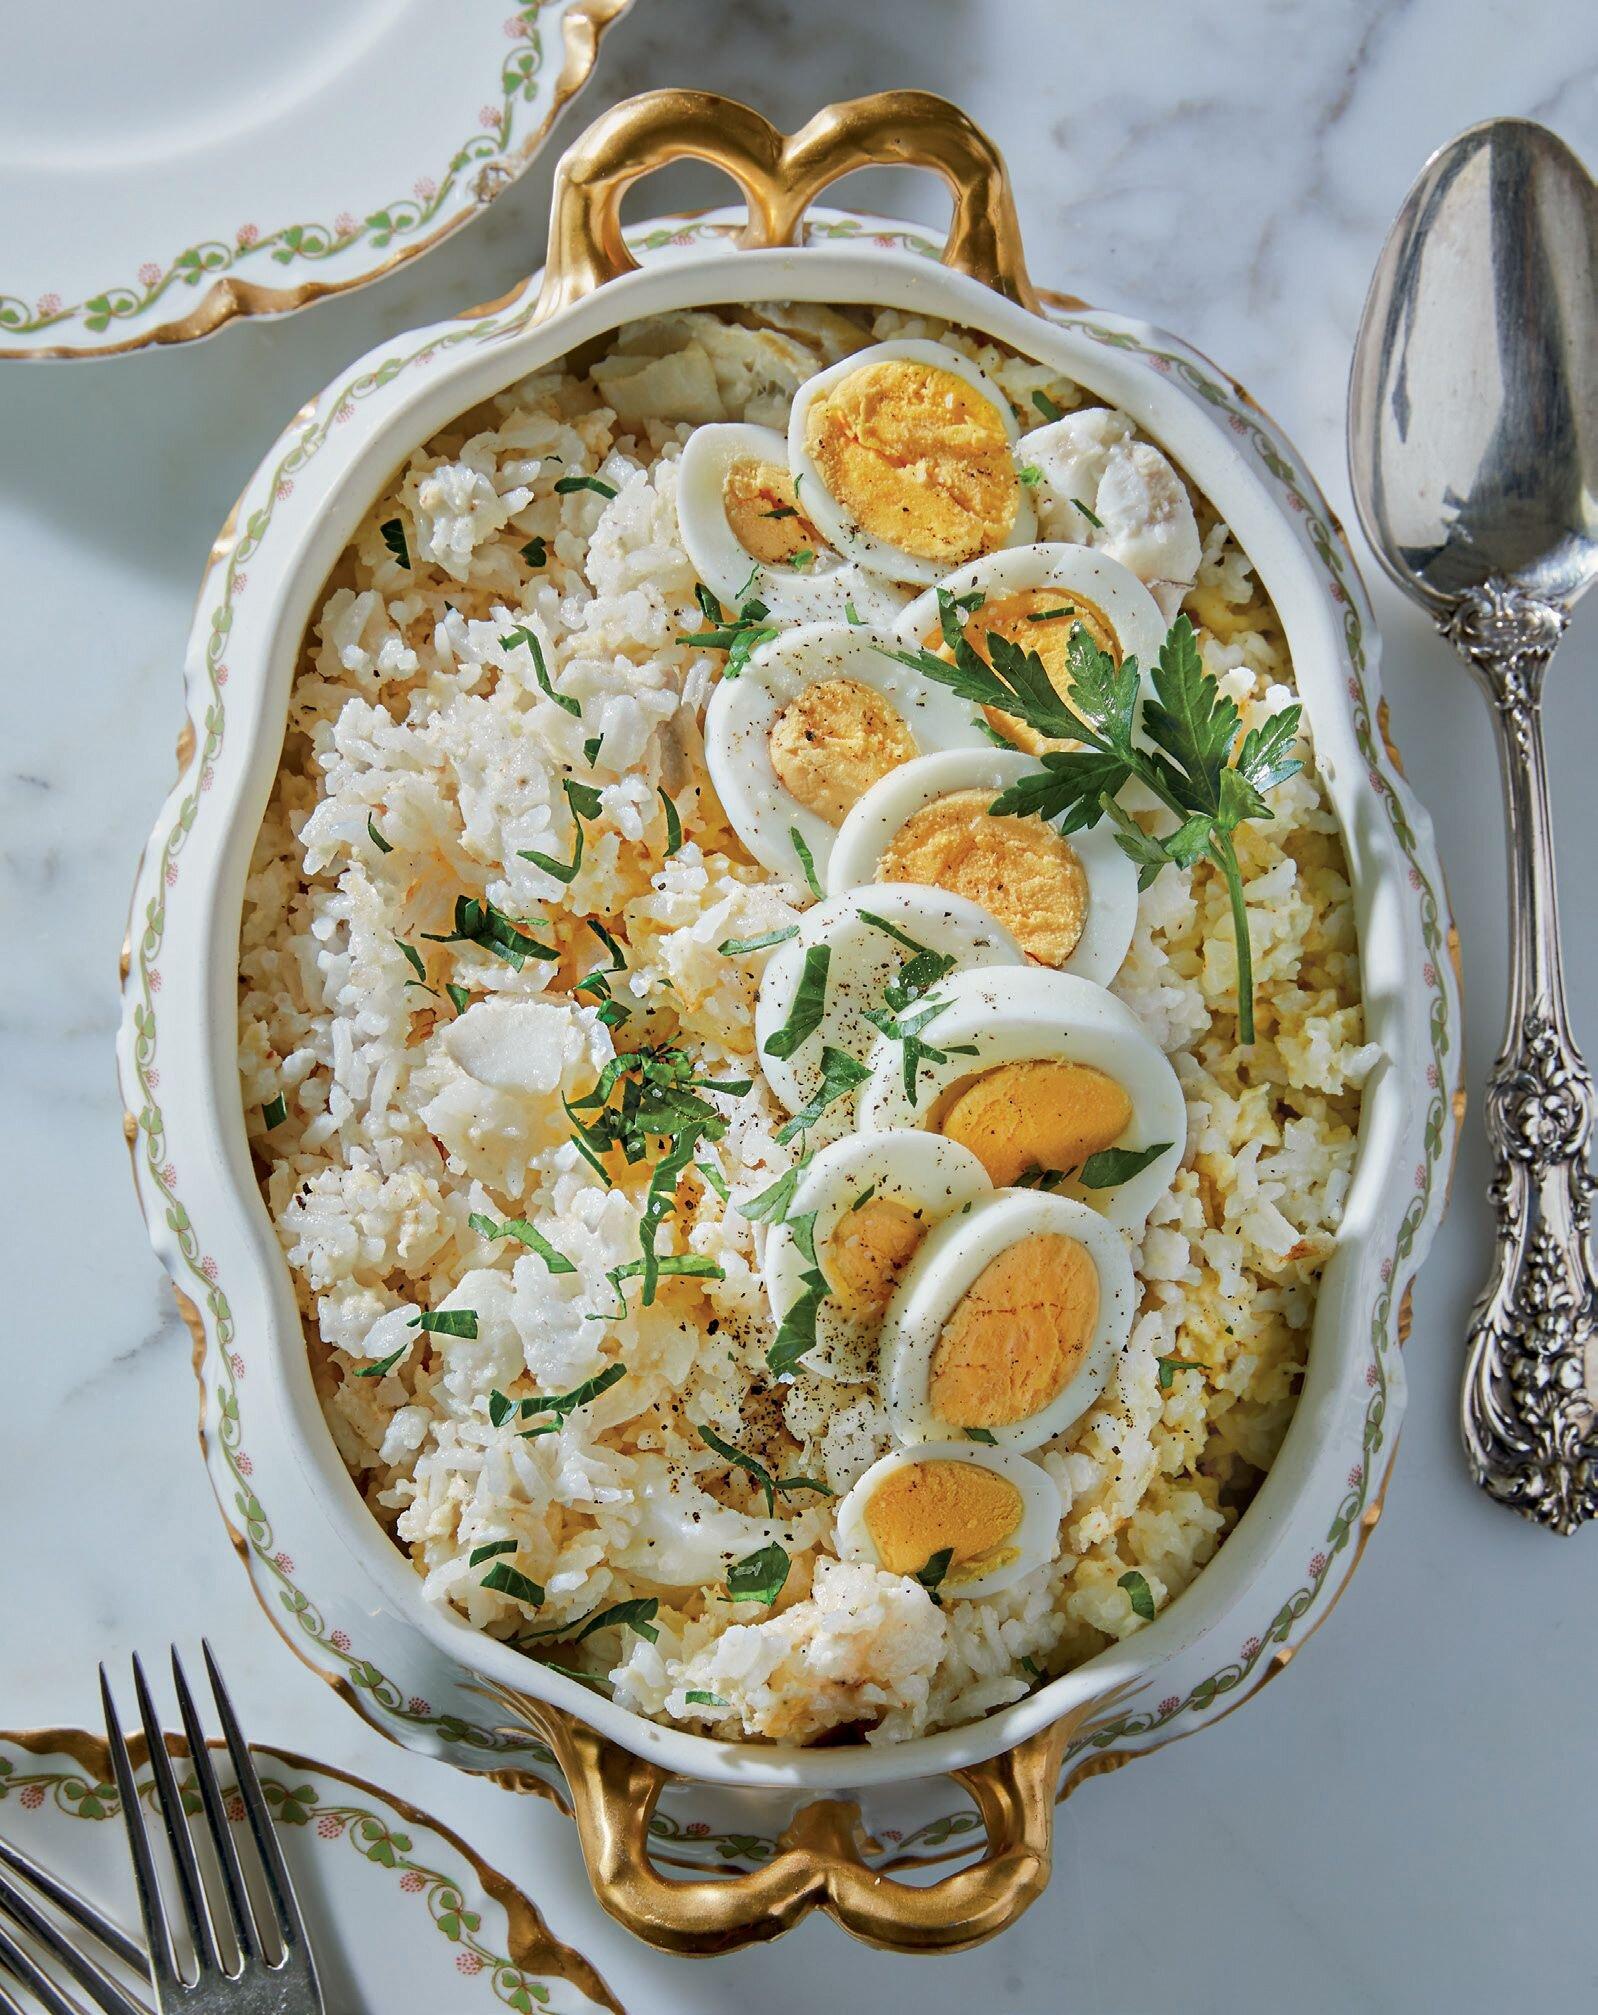 Kedgeree: the quintessential breakfast dish at Downton Abbey.